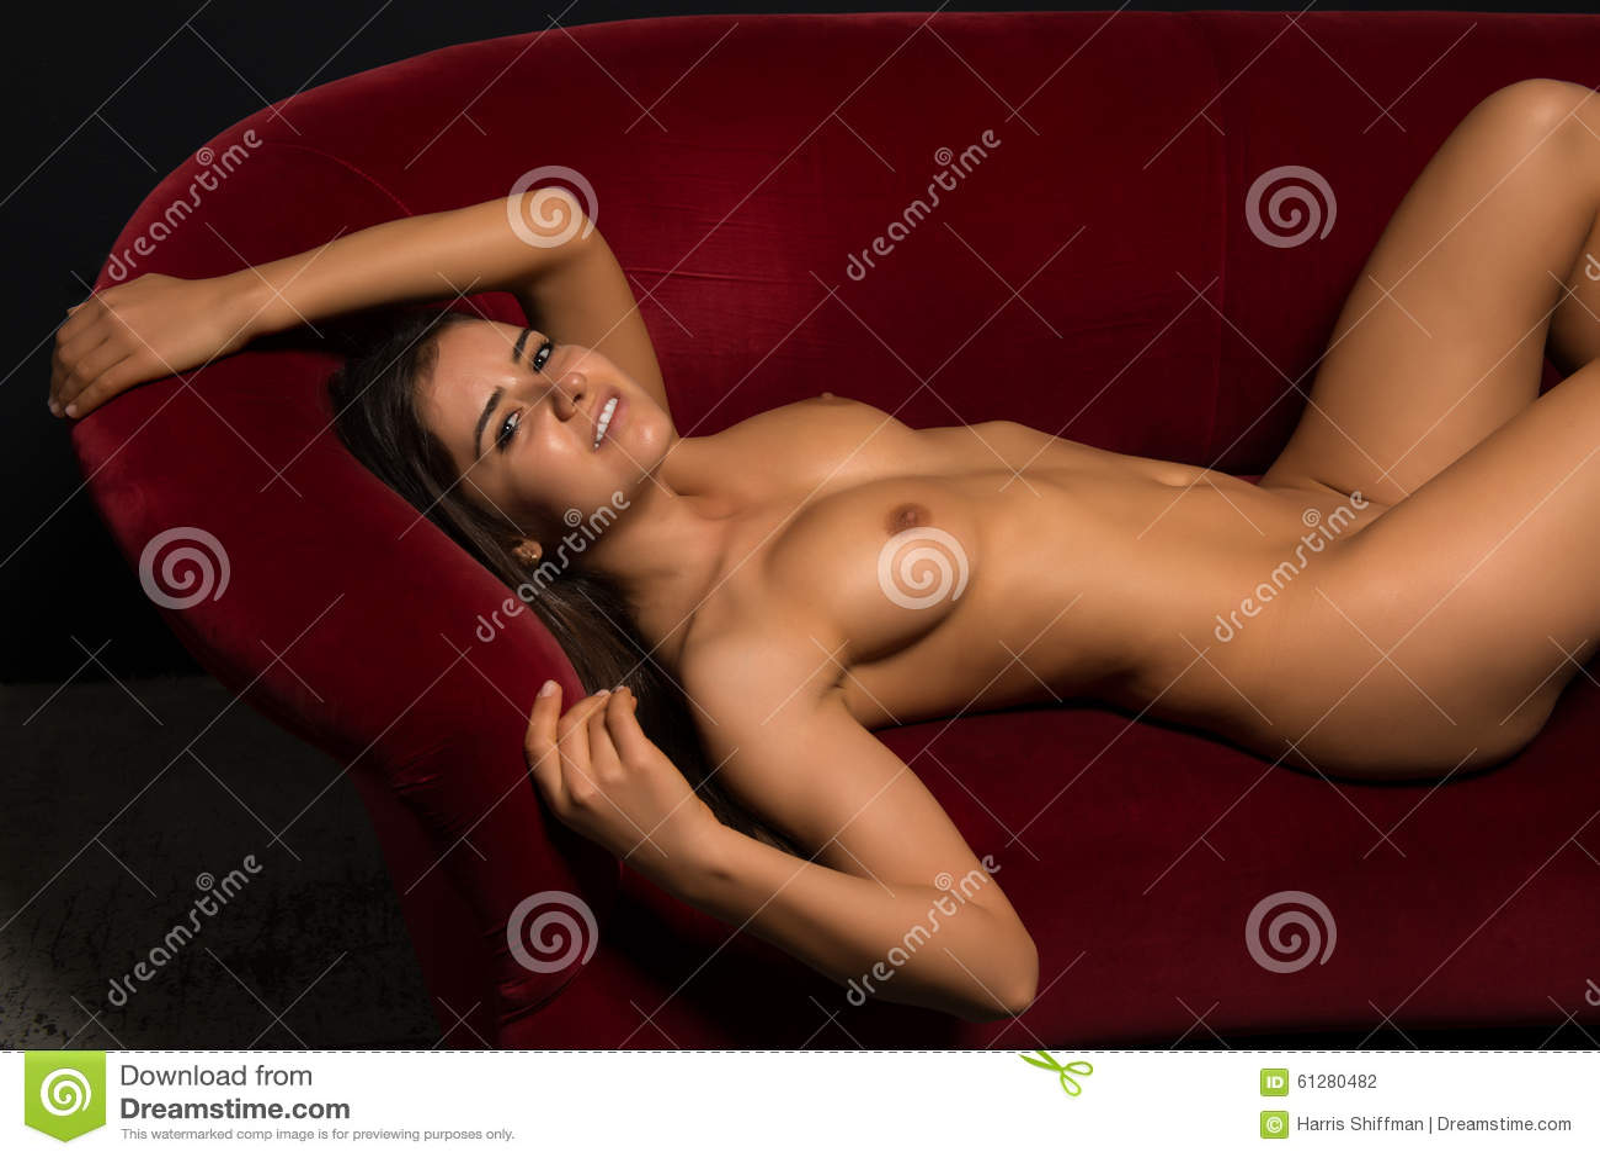 Ramya krishnan nudu picture